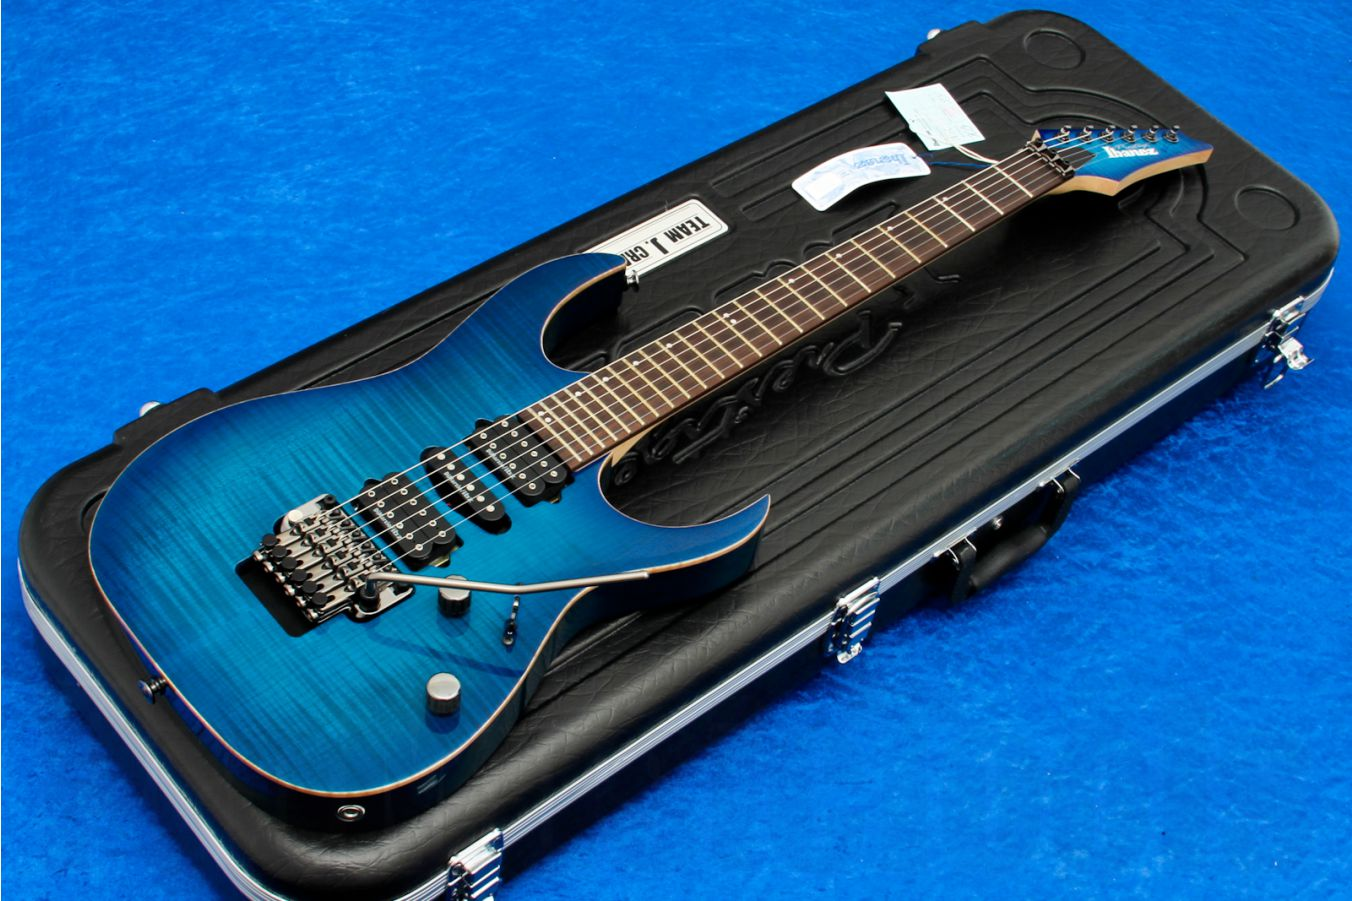 Ibanez RG2770Z SPB Prestige - Sapphire Blue Limited Edition